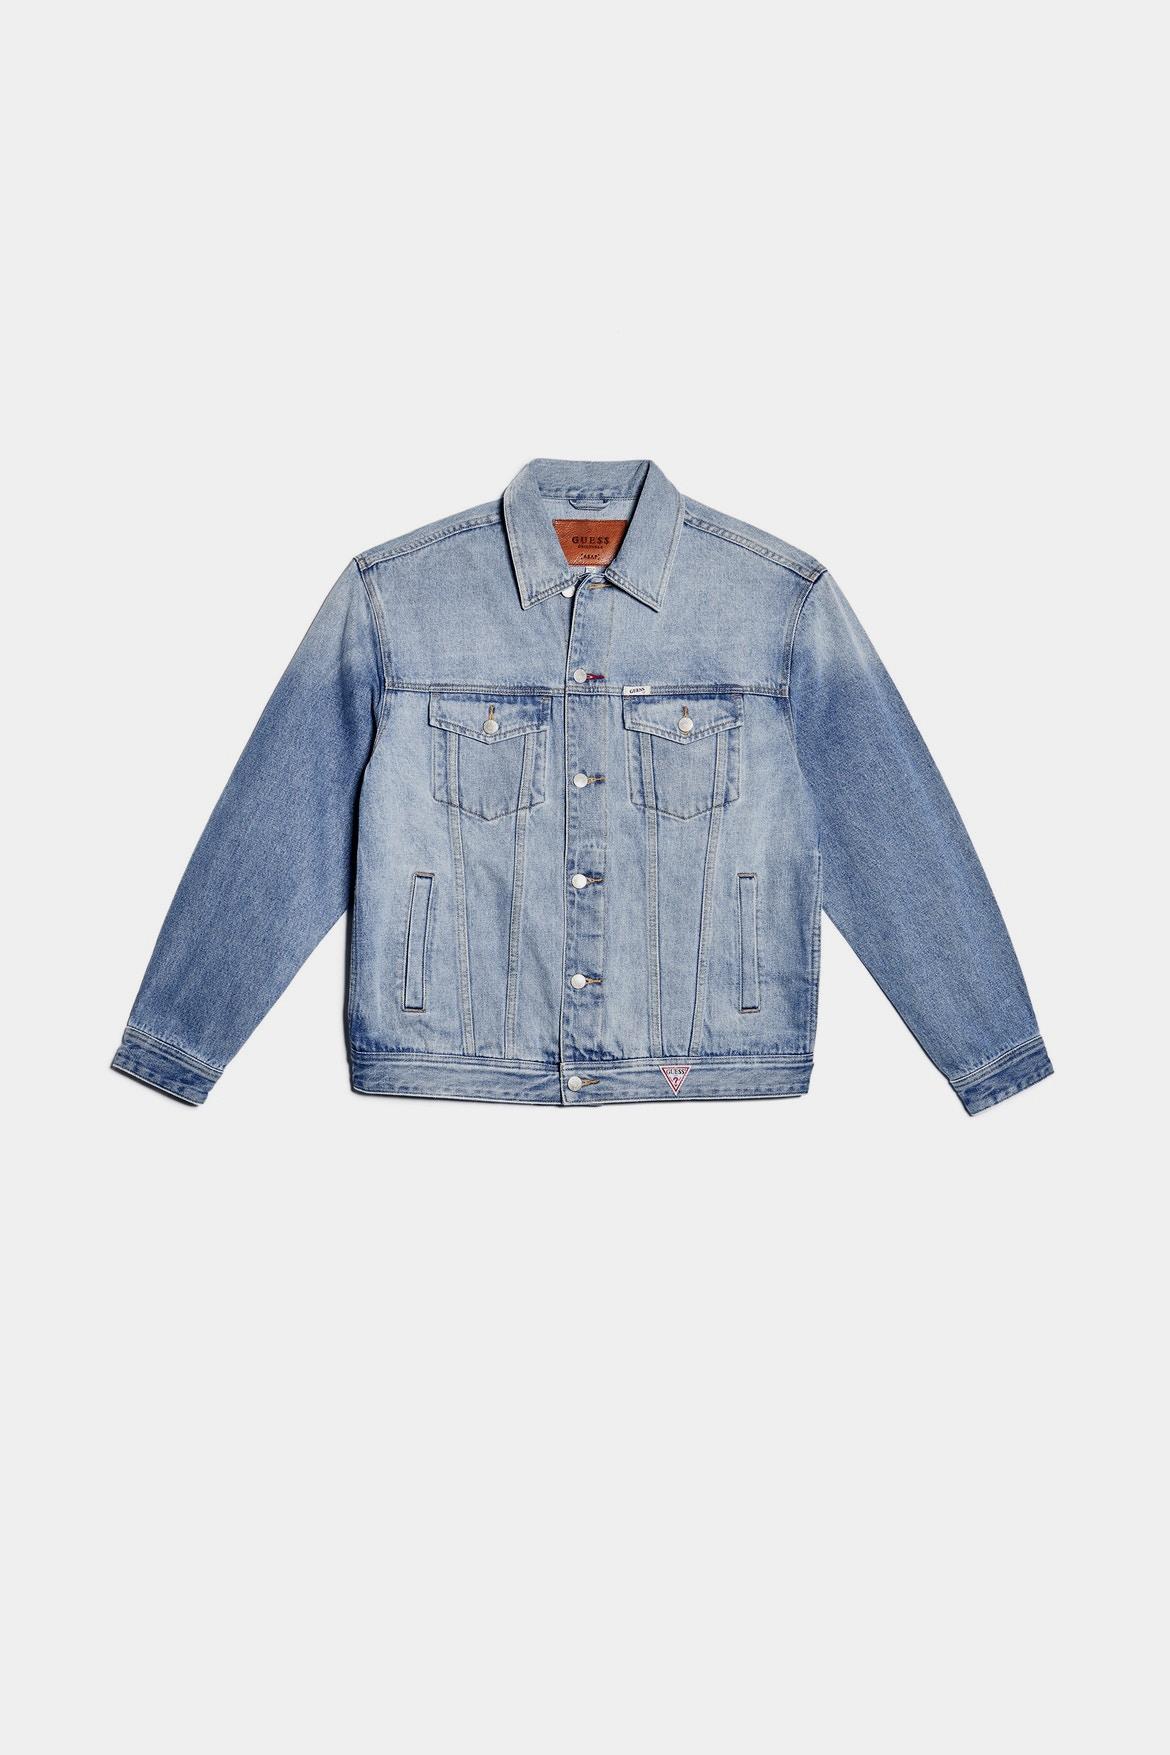 AG Jean jacket 2